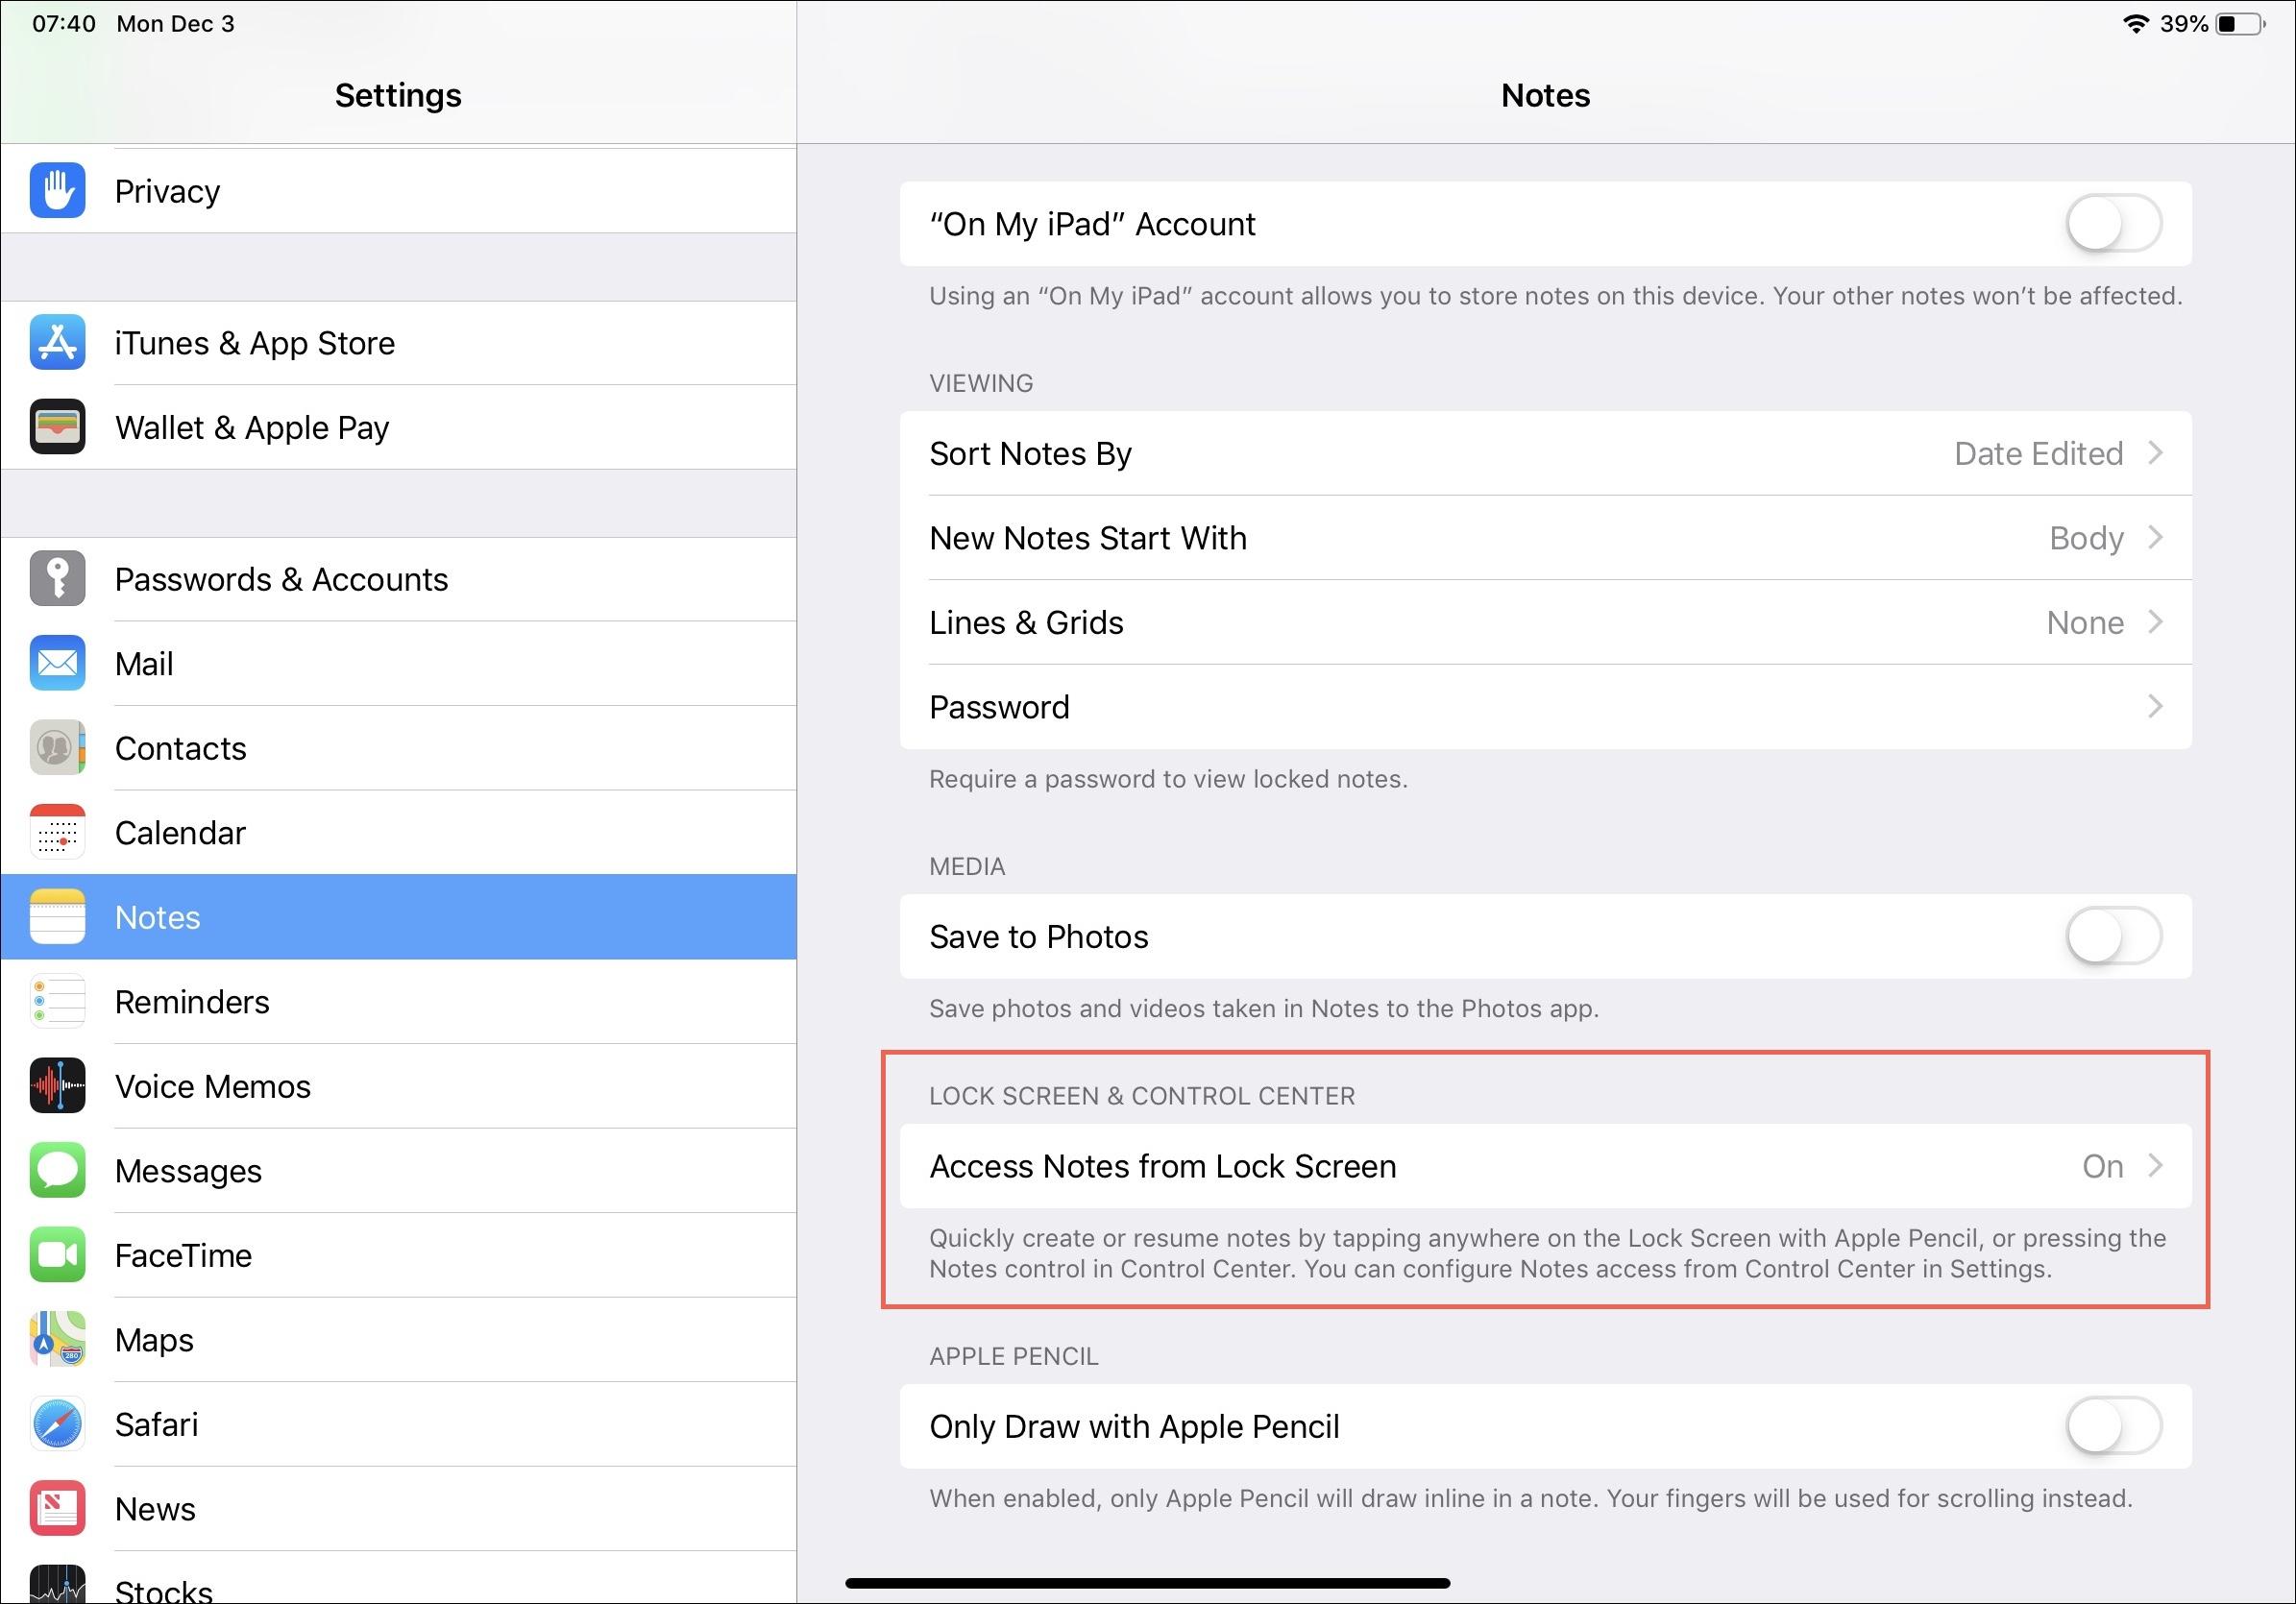 Access Notes on Lock Screen on iPad